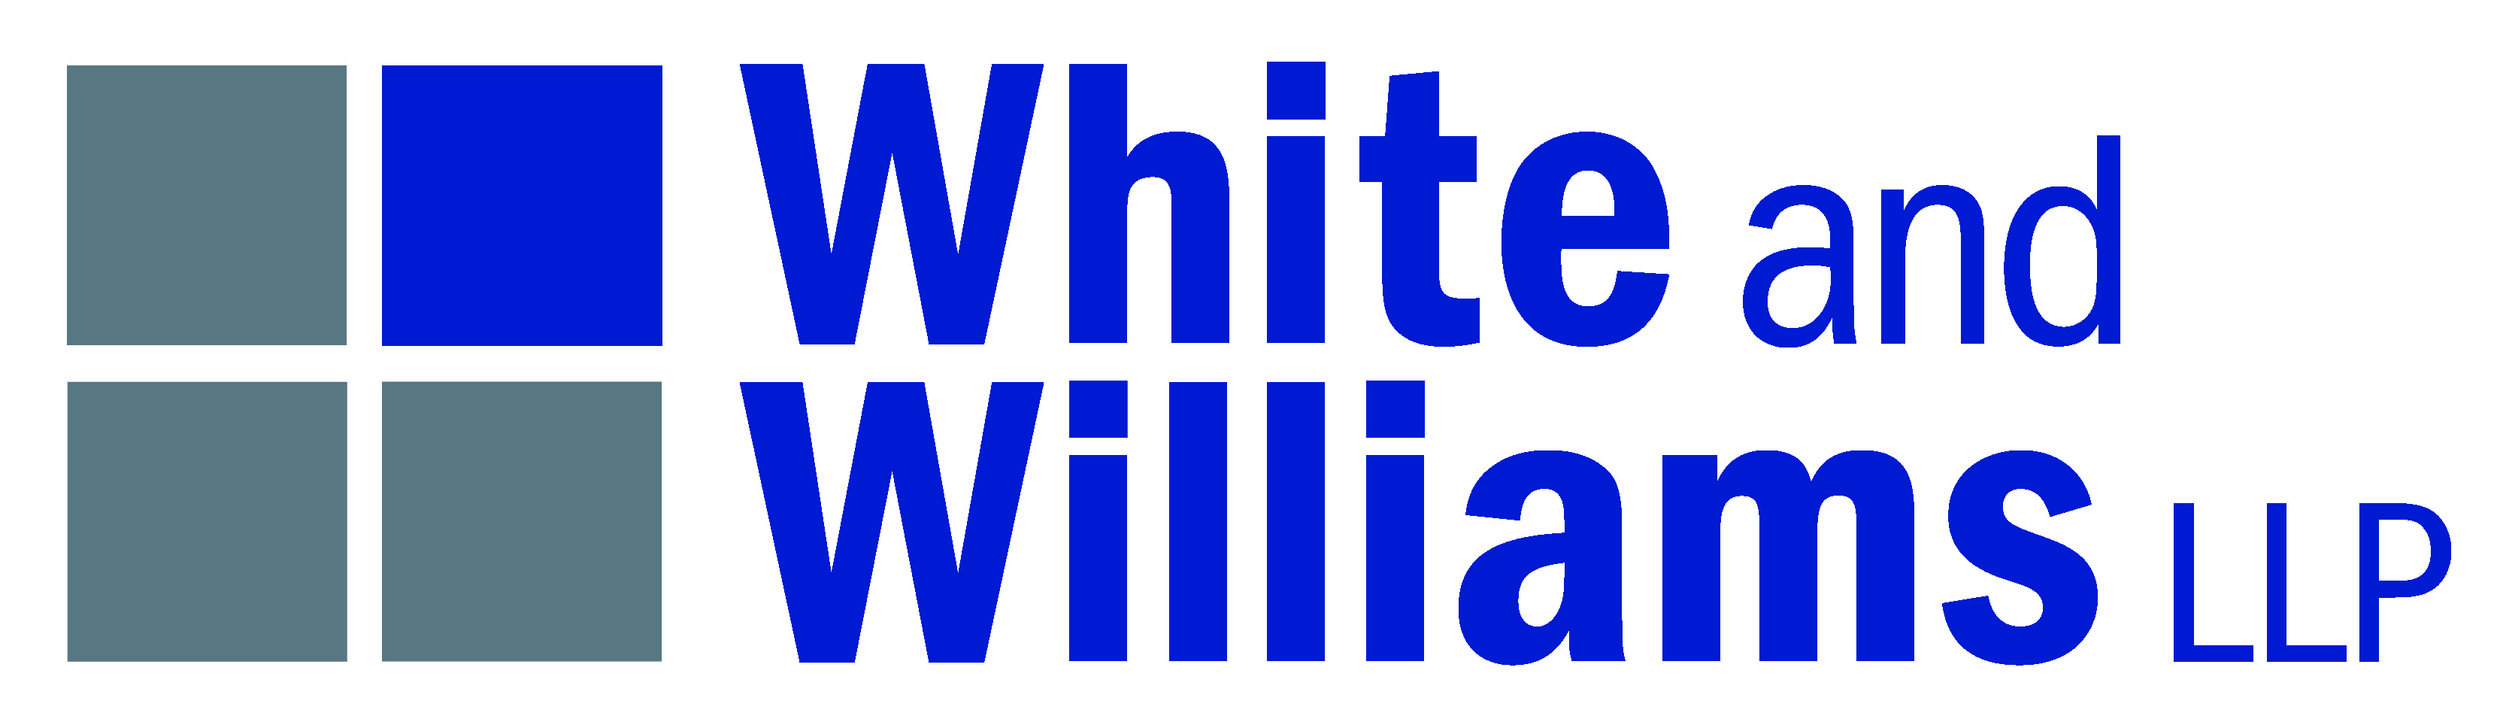 White and Williams - Logo.jpg